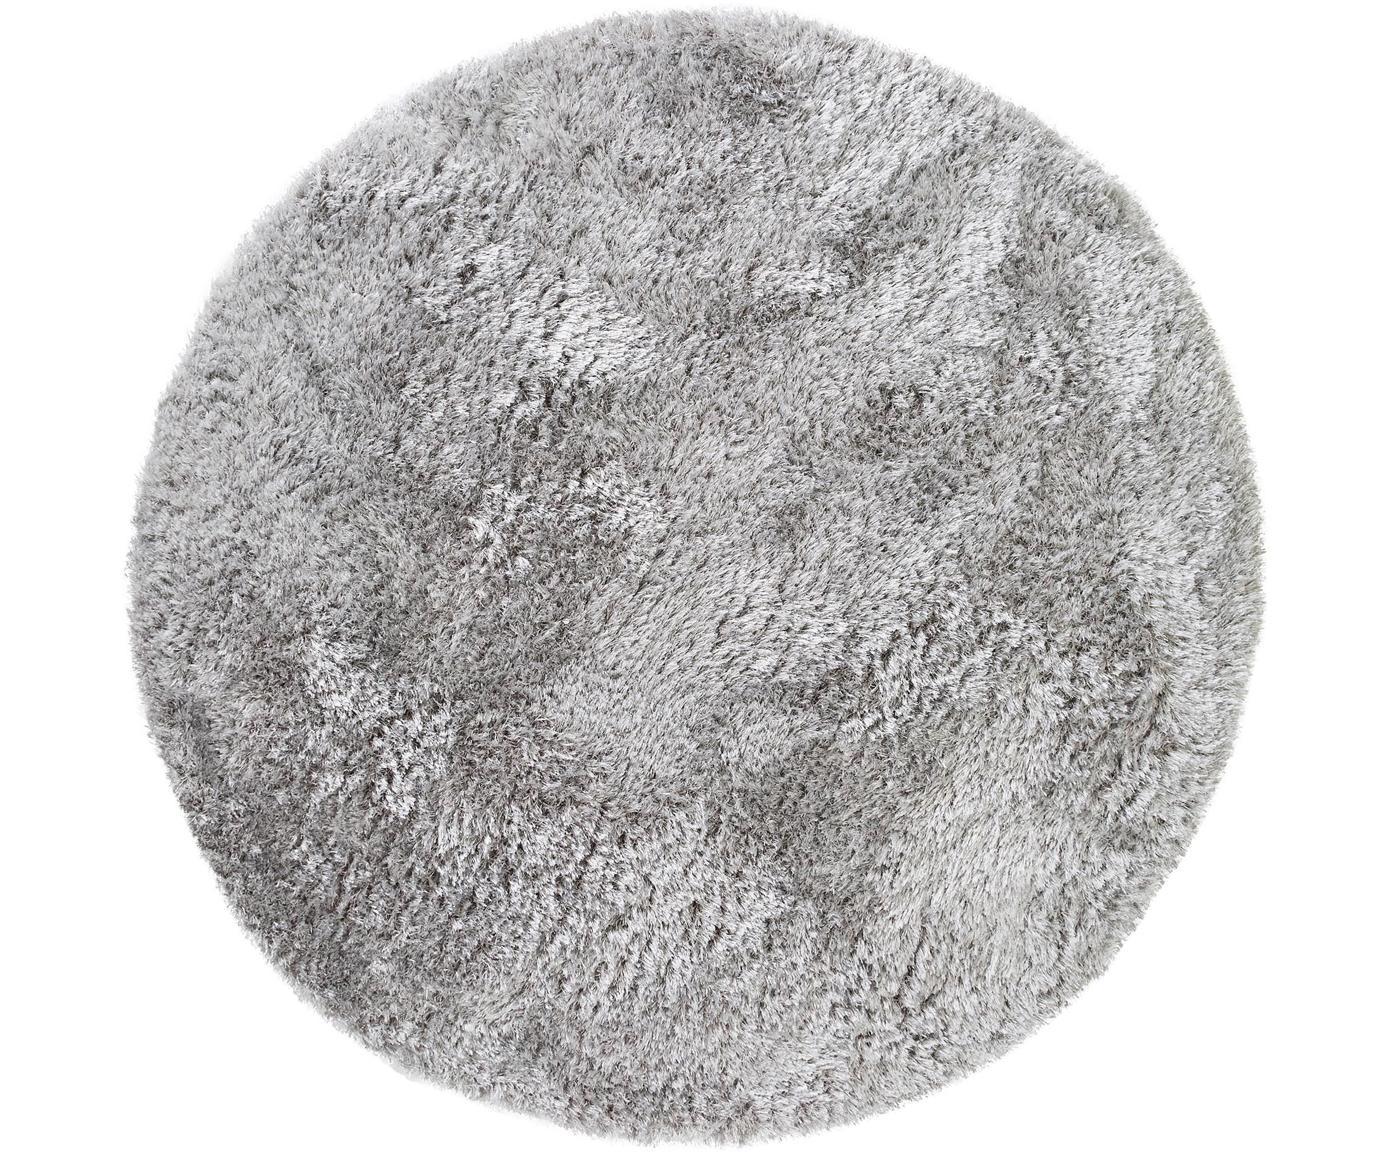 Alfombra redonda de pelo largo Lea, 50%poliéster, 50%polipropileno, Gris, Ø 120 cm (Tamaño S)